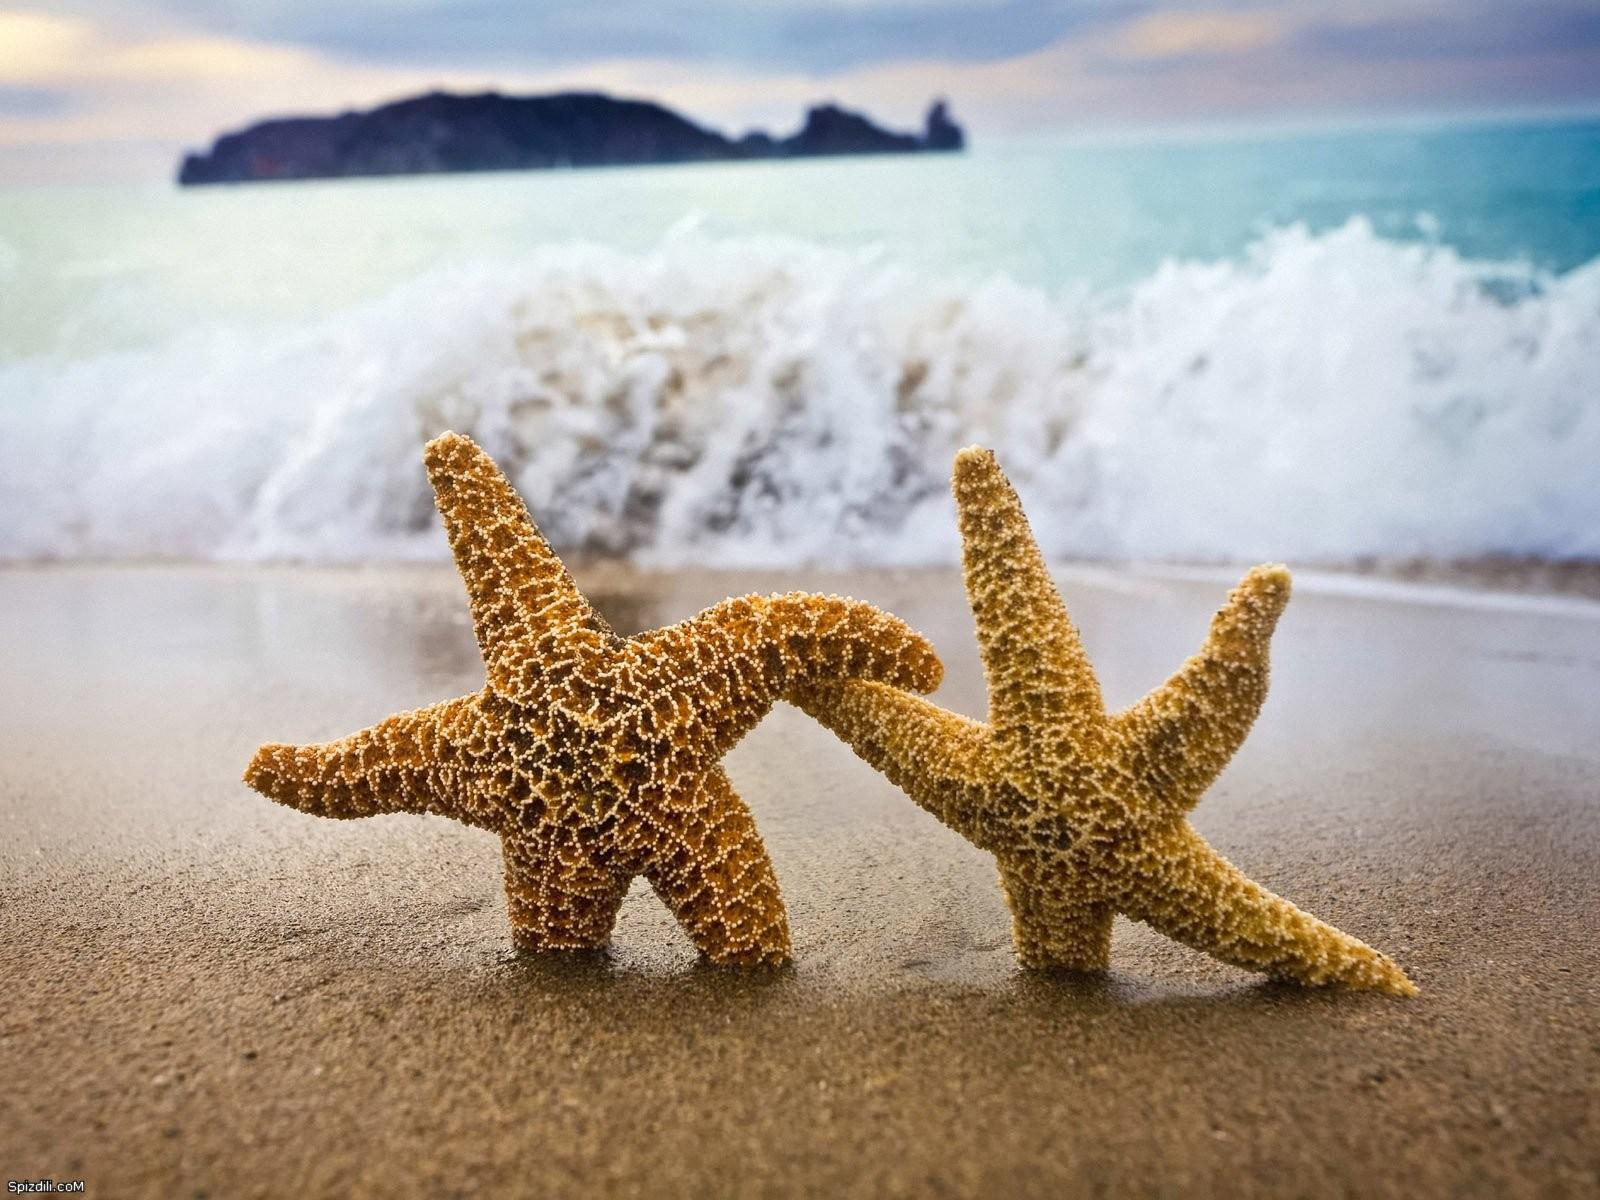 Seastars starfish 1600x1200